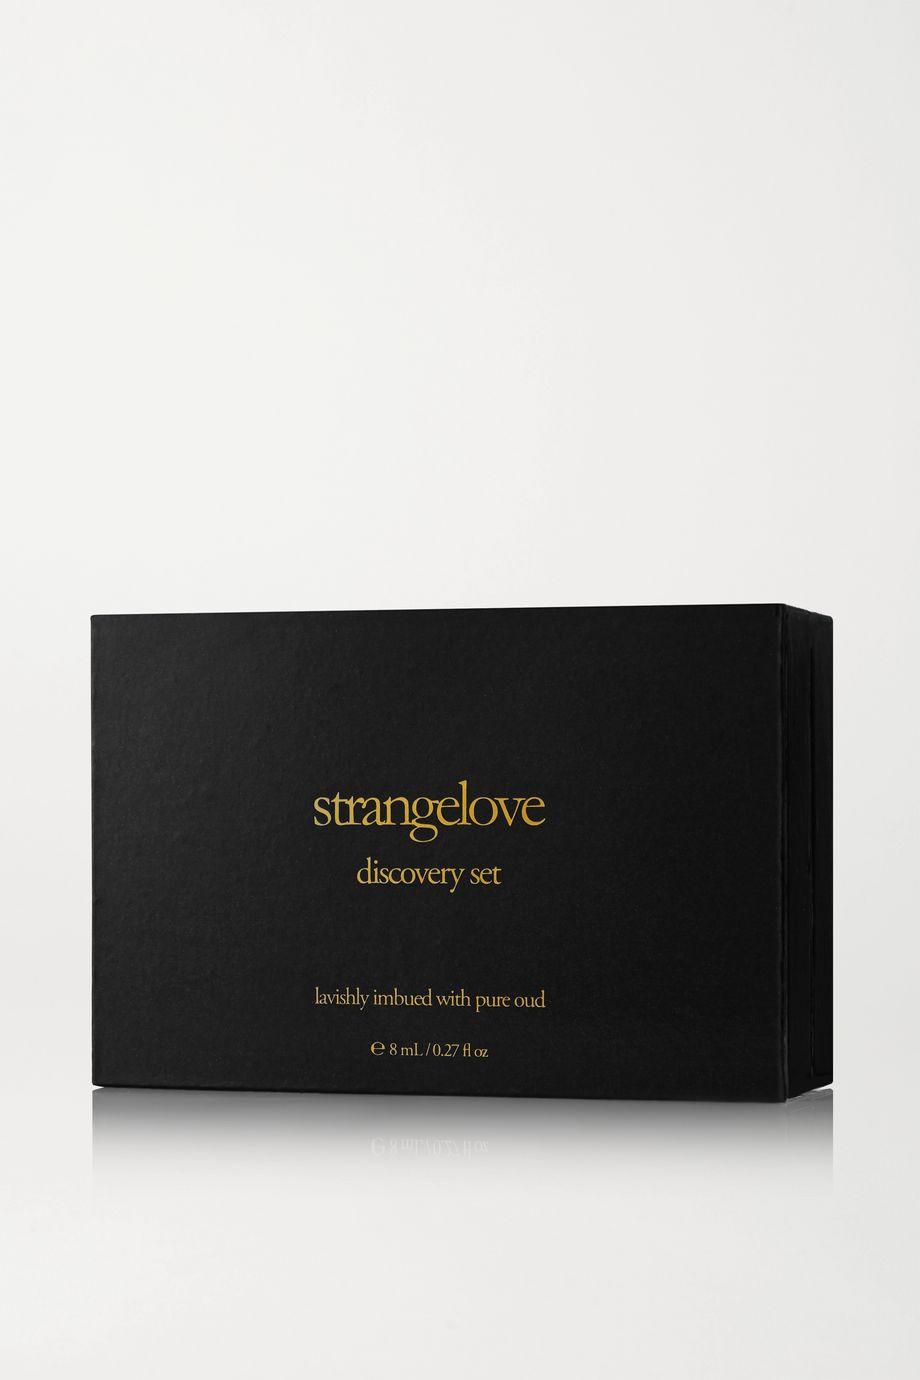 strangelove nyc Discovery Set, 4 x 2ml